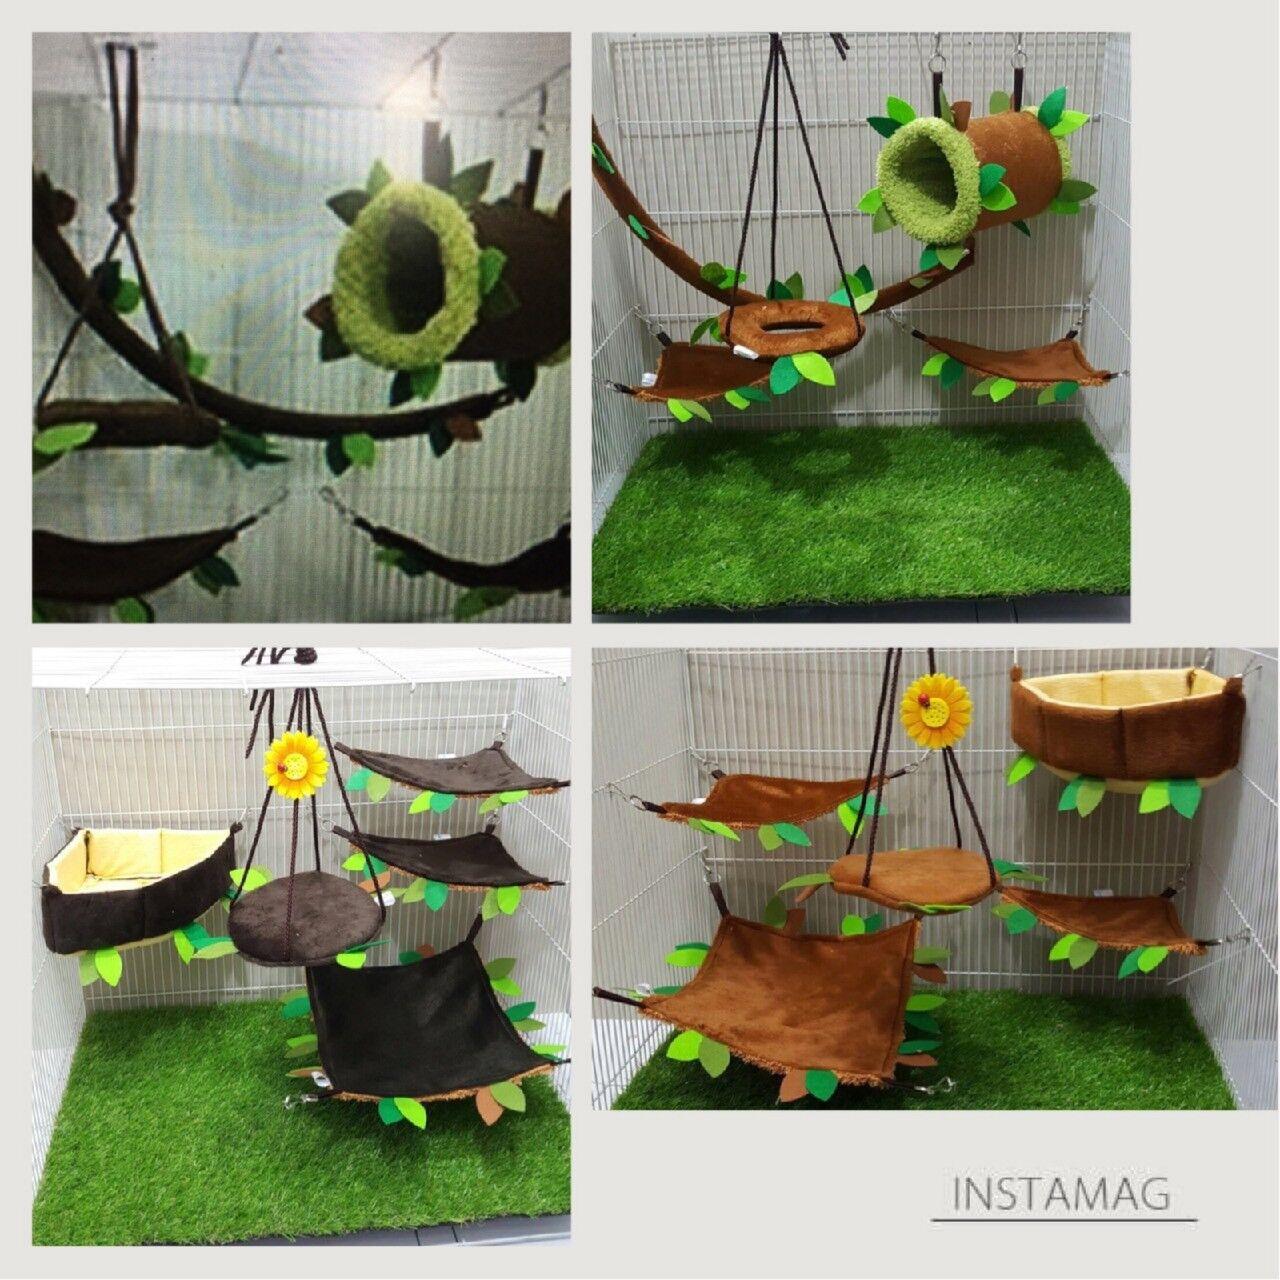 4 Sets     5 Pcs Sugar Glider Cage Set Tunnel Bed 2 Sets, Cushion Bed 2 Sets.